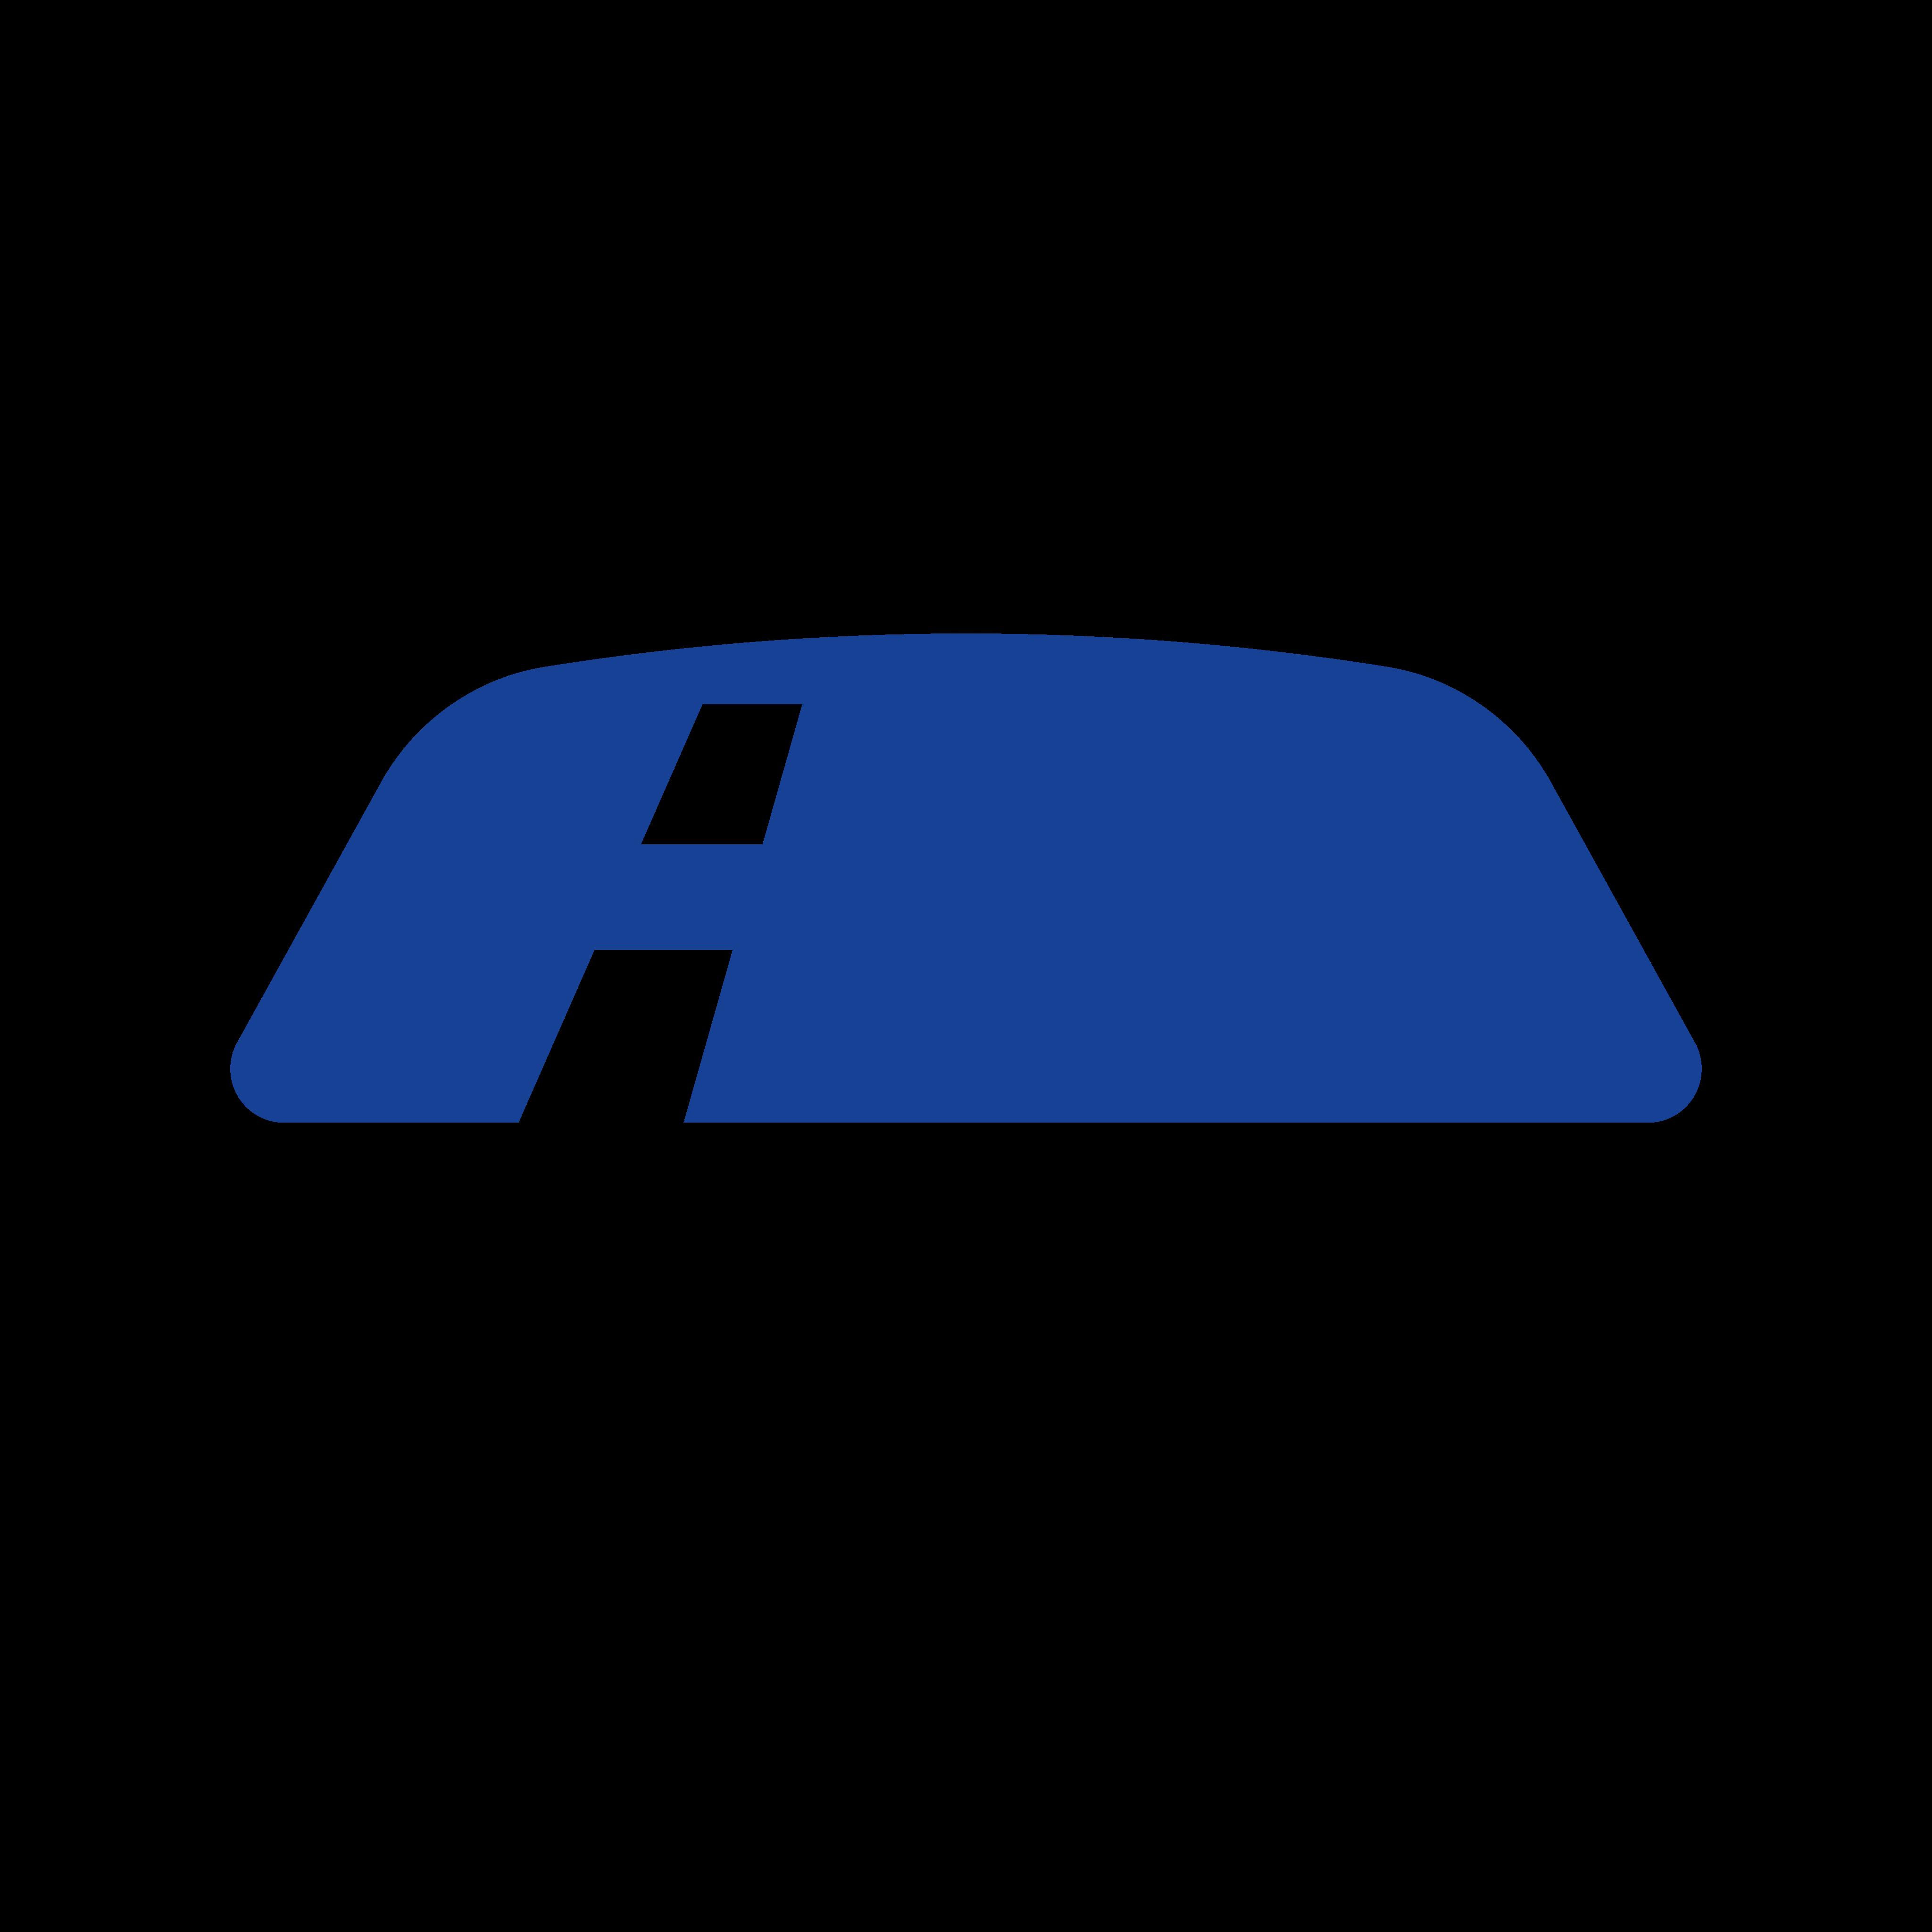 autoglass logo 0 - AUTOGLASS Logo